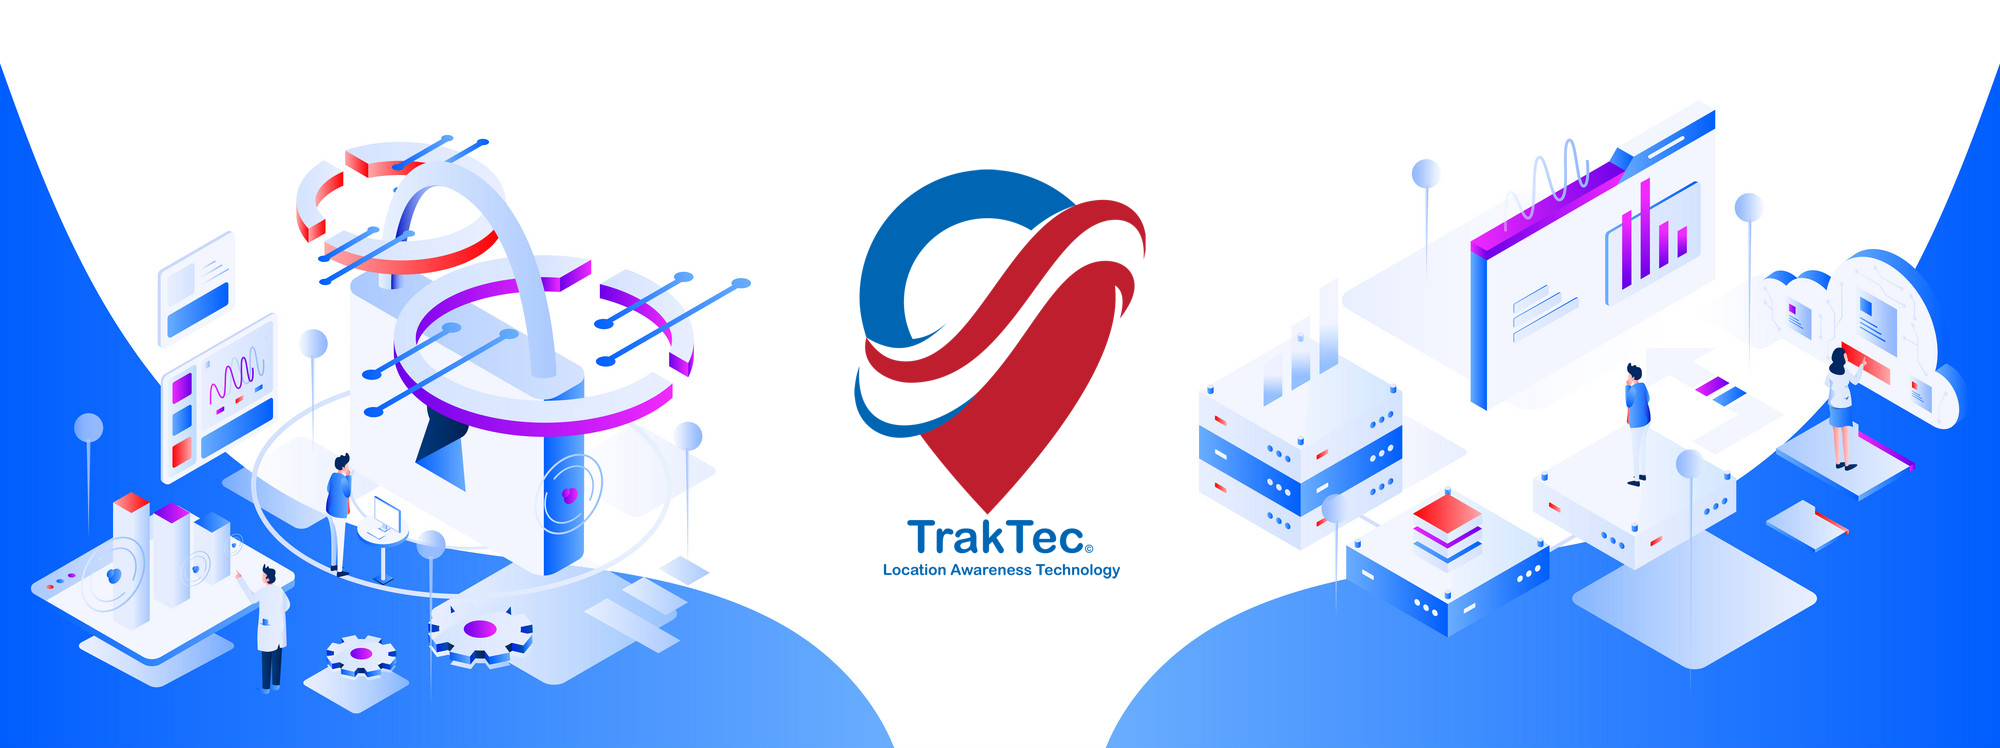 TrakTec Location Awareness Technology Banner Image Big Data